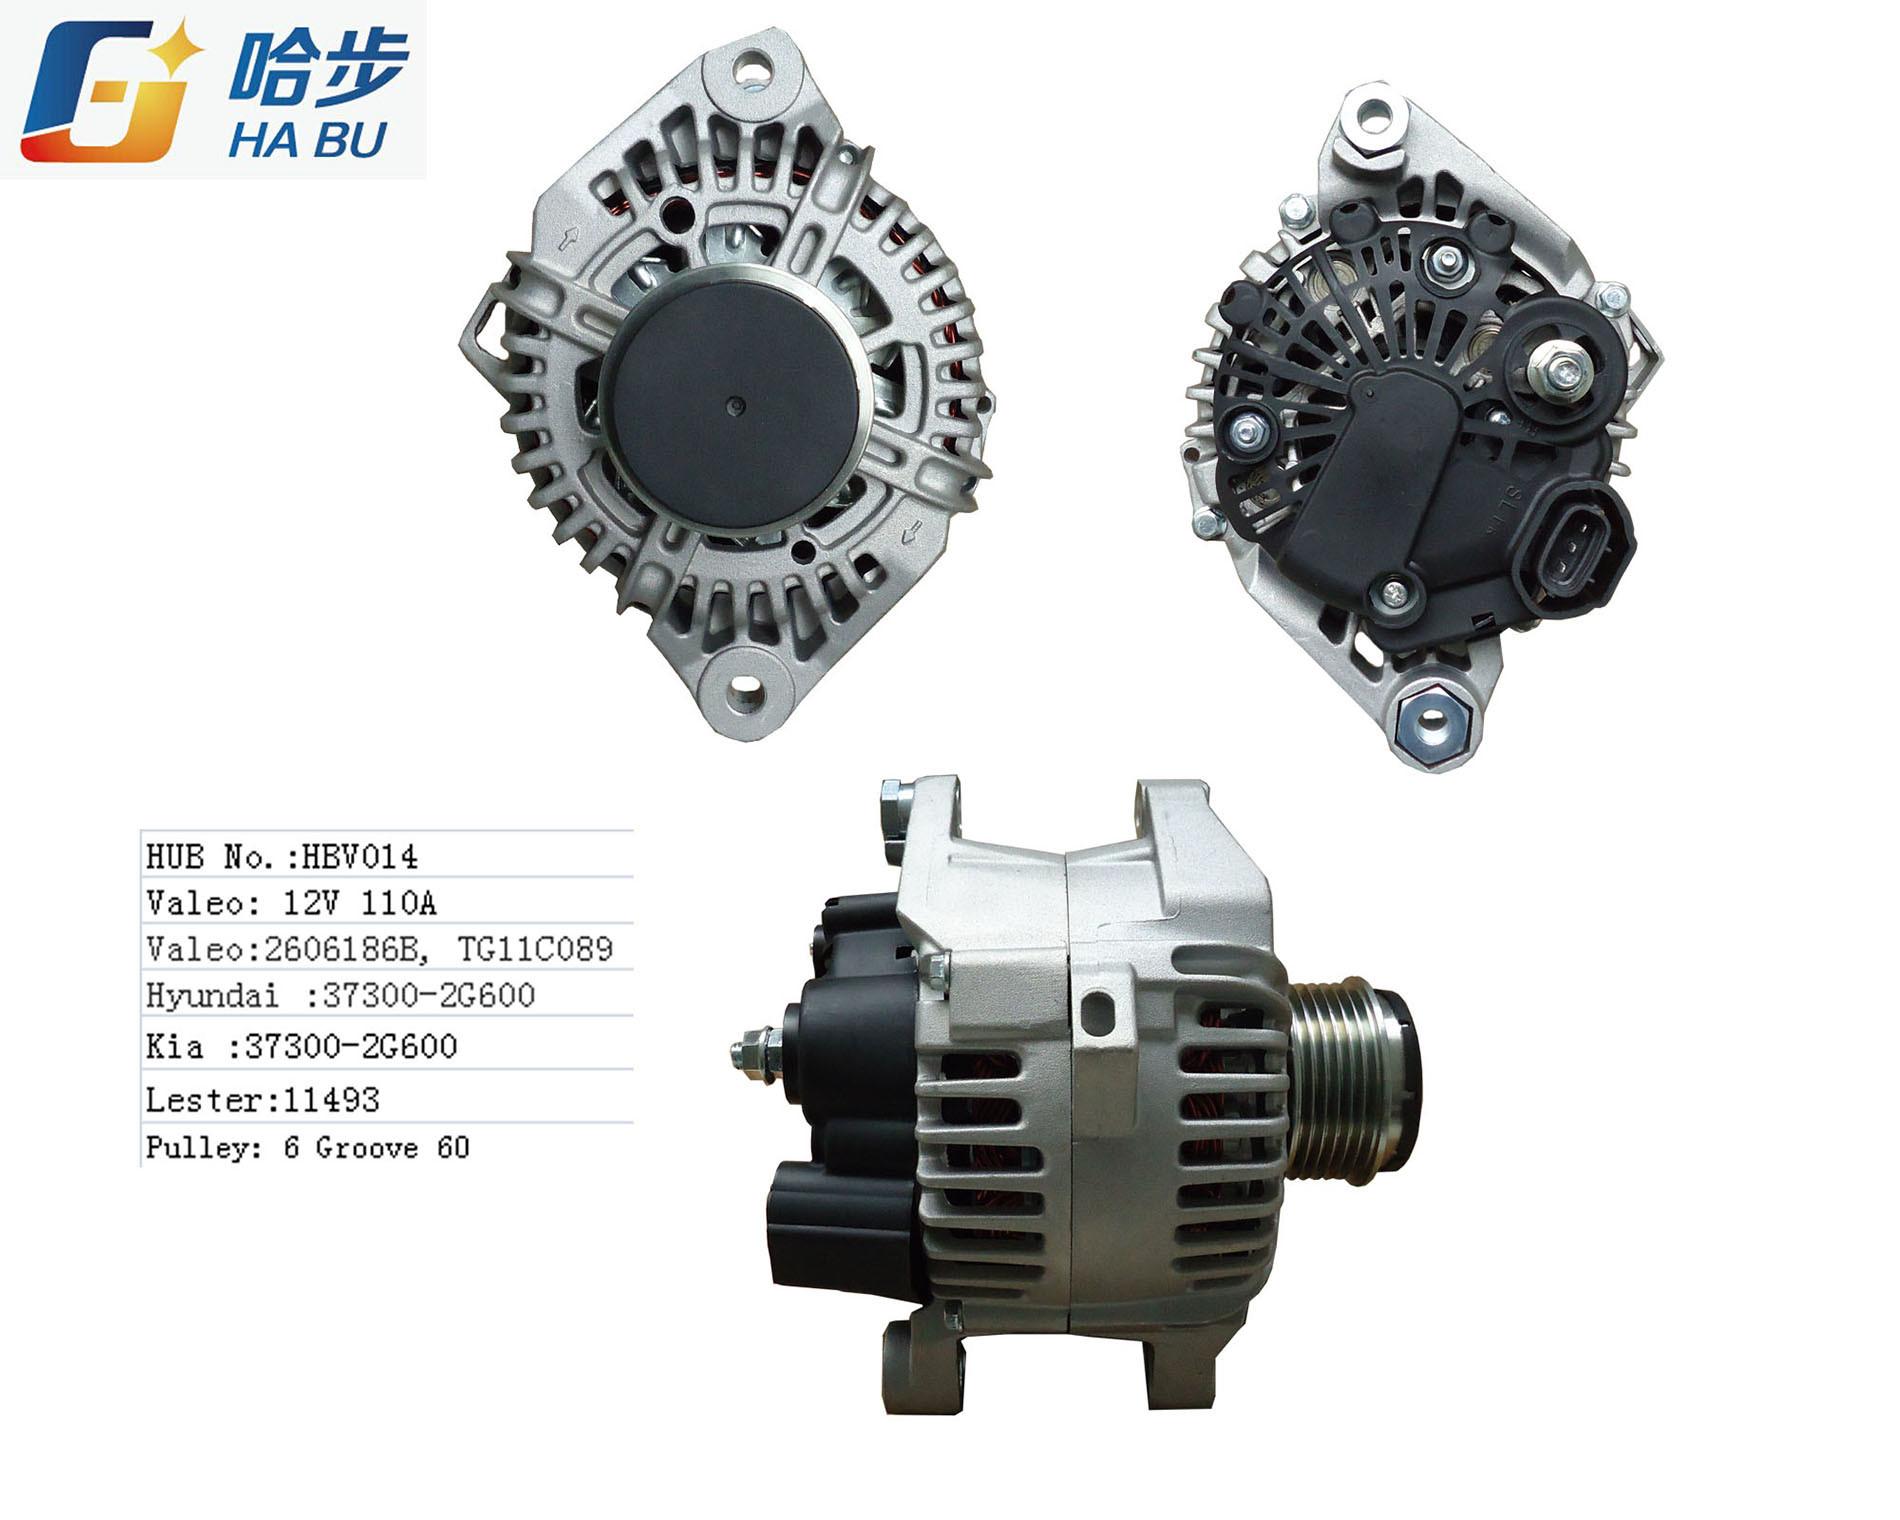 11 12 13 Alternator Generator 37300-2g600